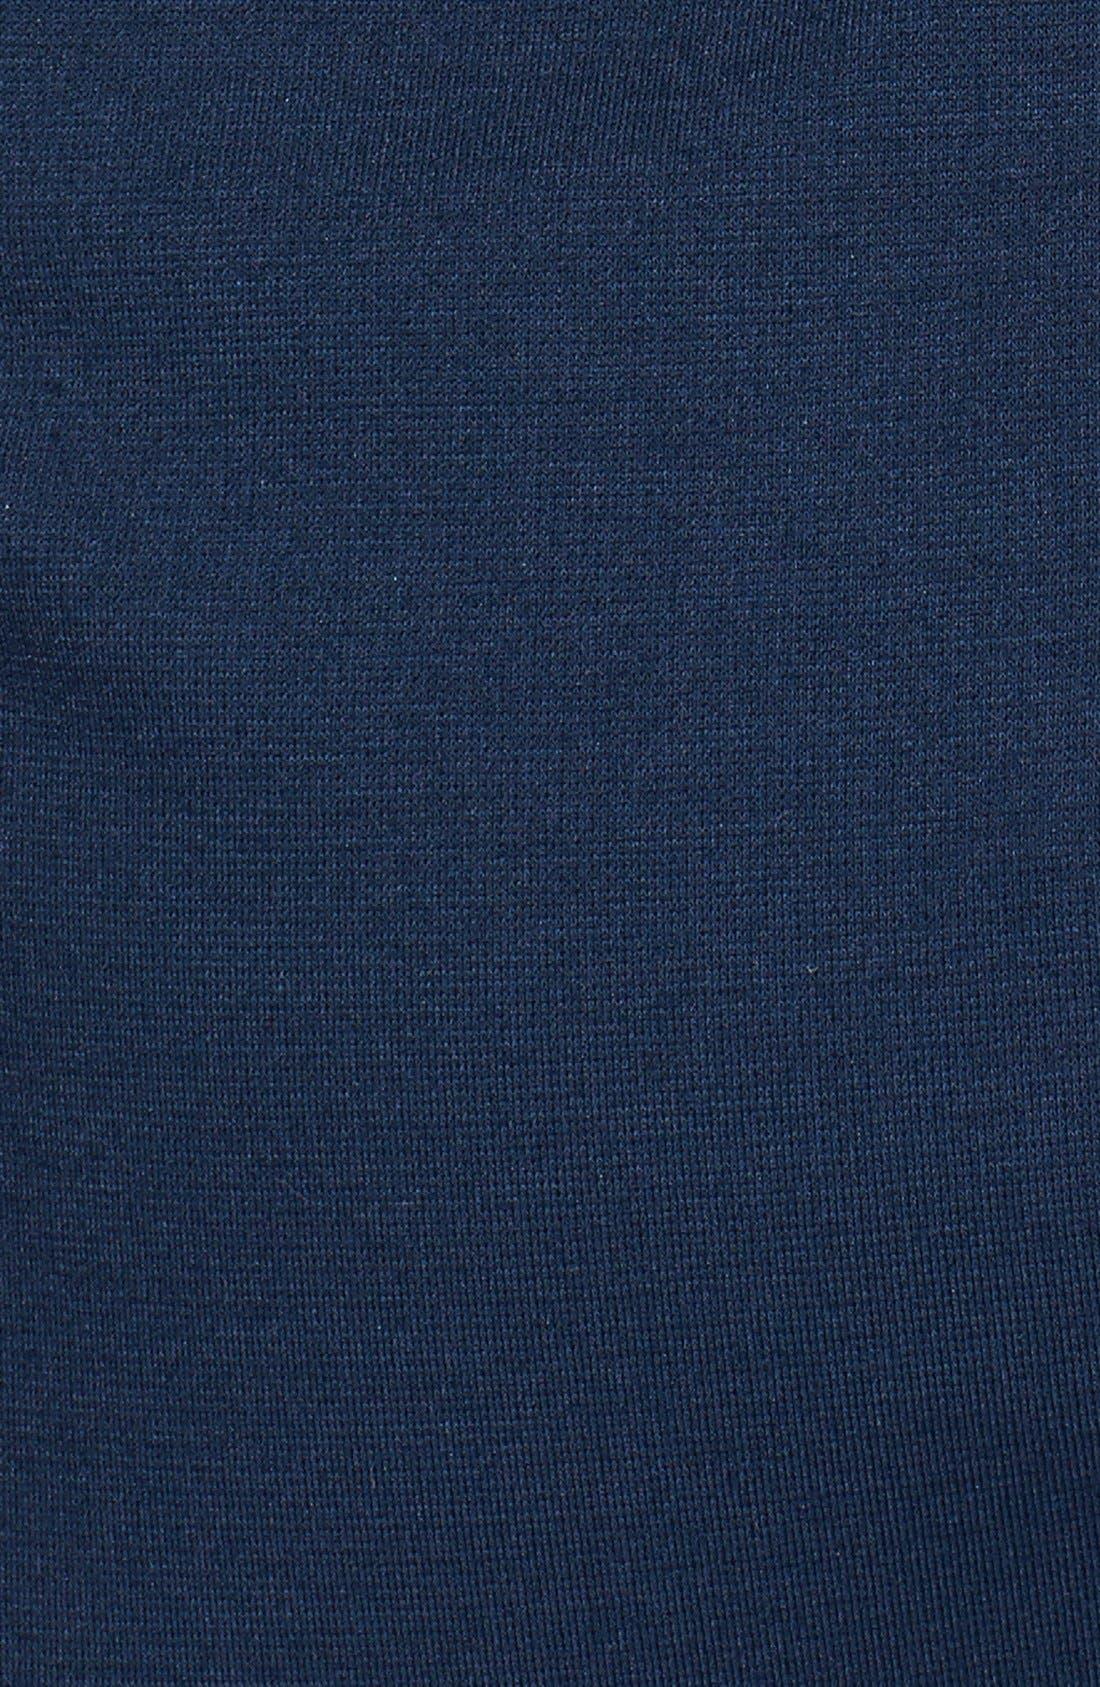 Alternate Image 3  - Jay Godfrey 'Vaughn' Faux Leather &  Ponte Knit Dress